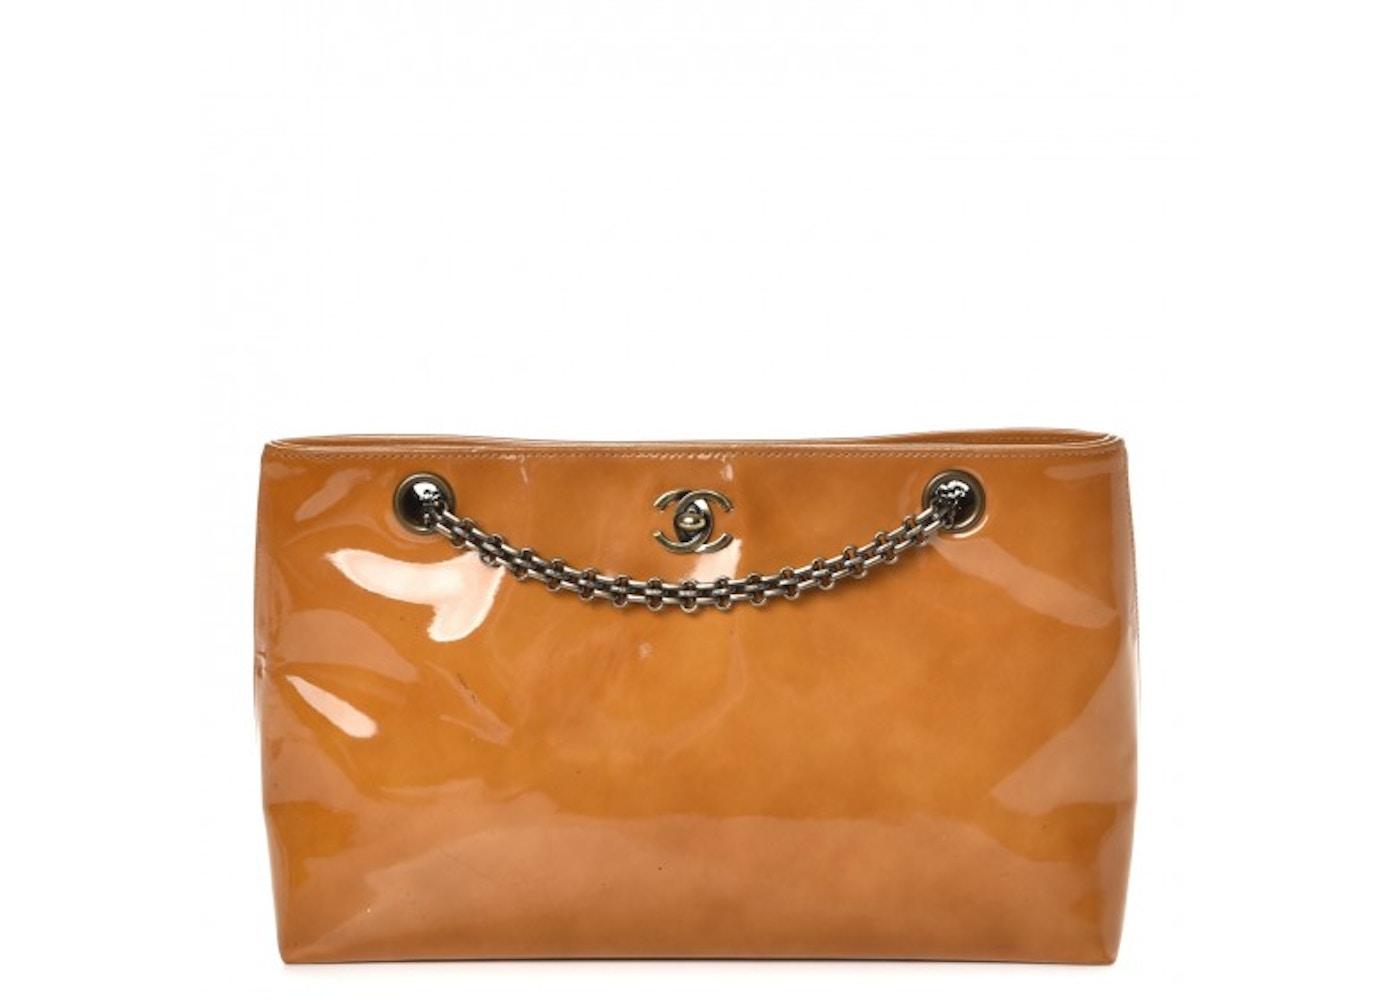 Chanel Shoulder Bag Tote Bijoux Chain